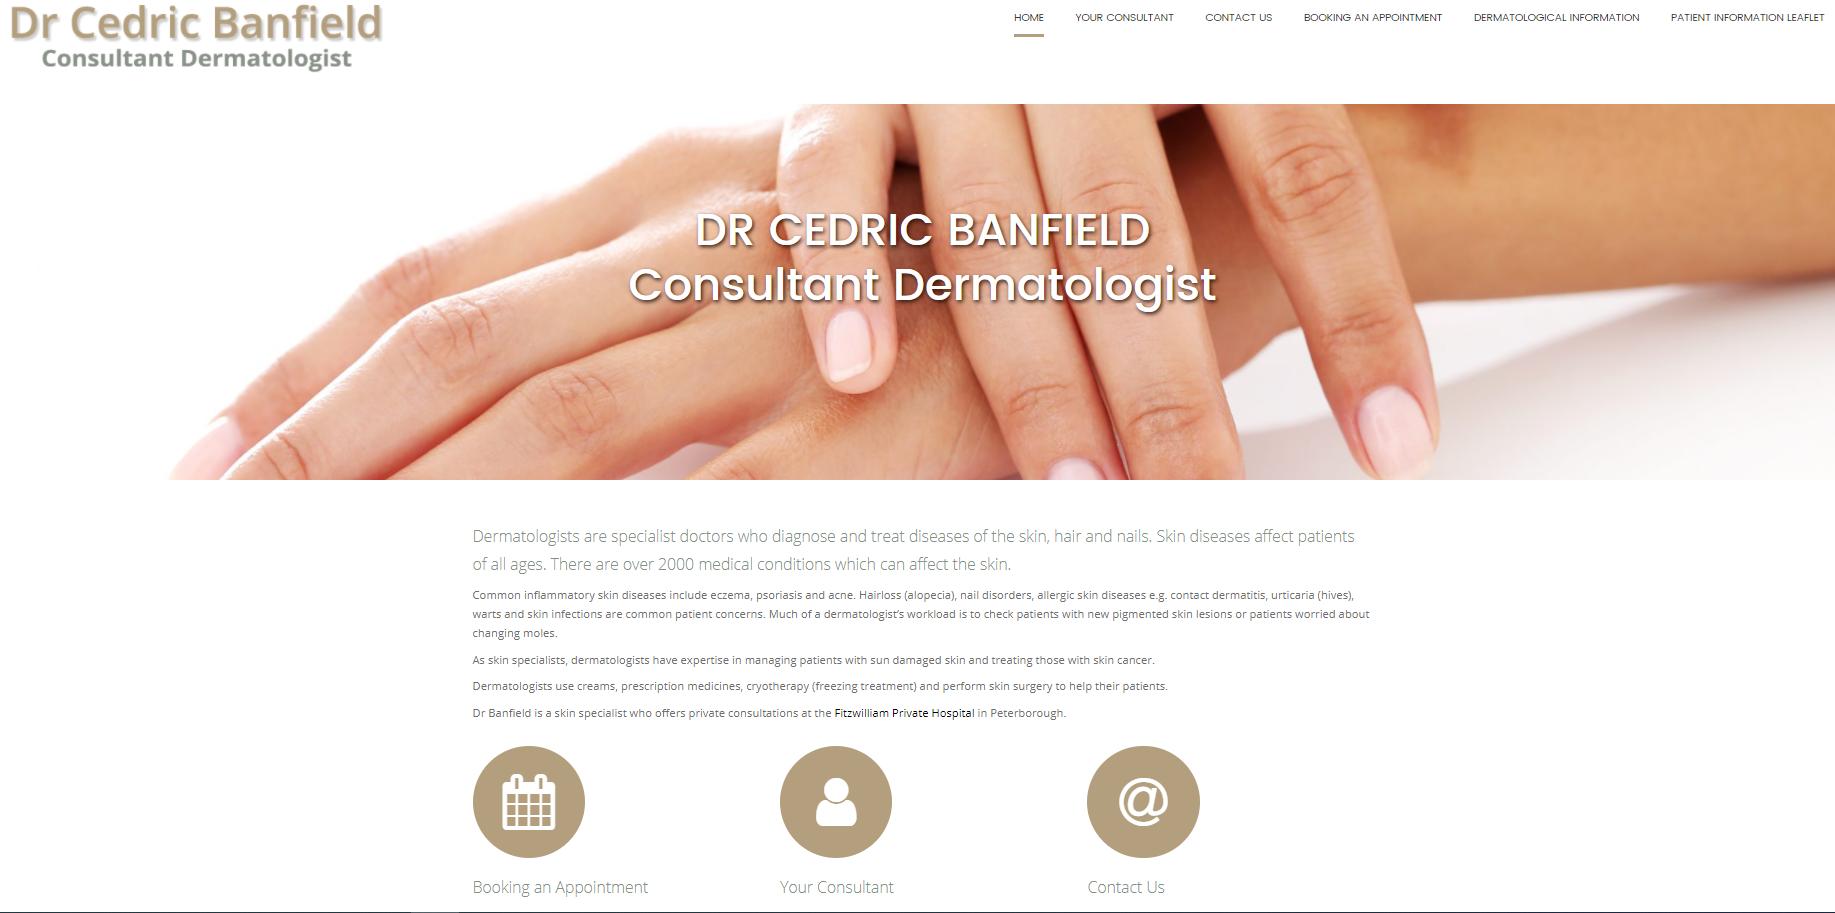 https://w2m.co.uk/project/cedric-banfield-consultant-dermatologist/